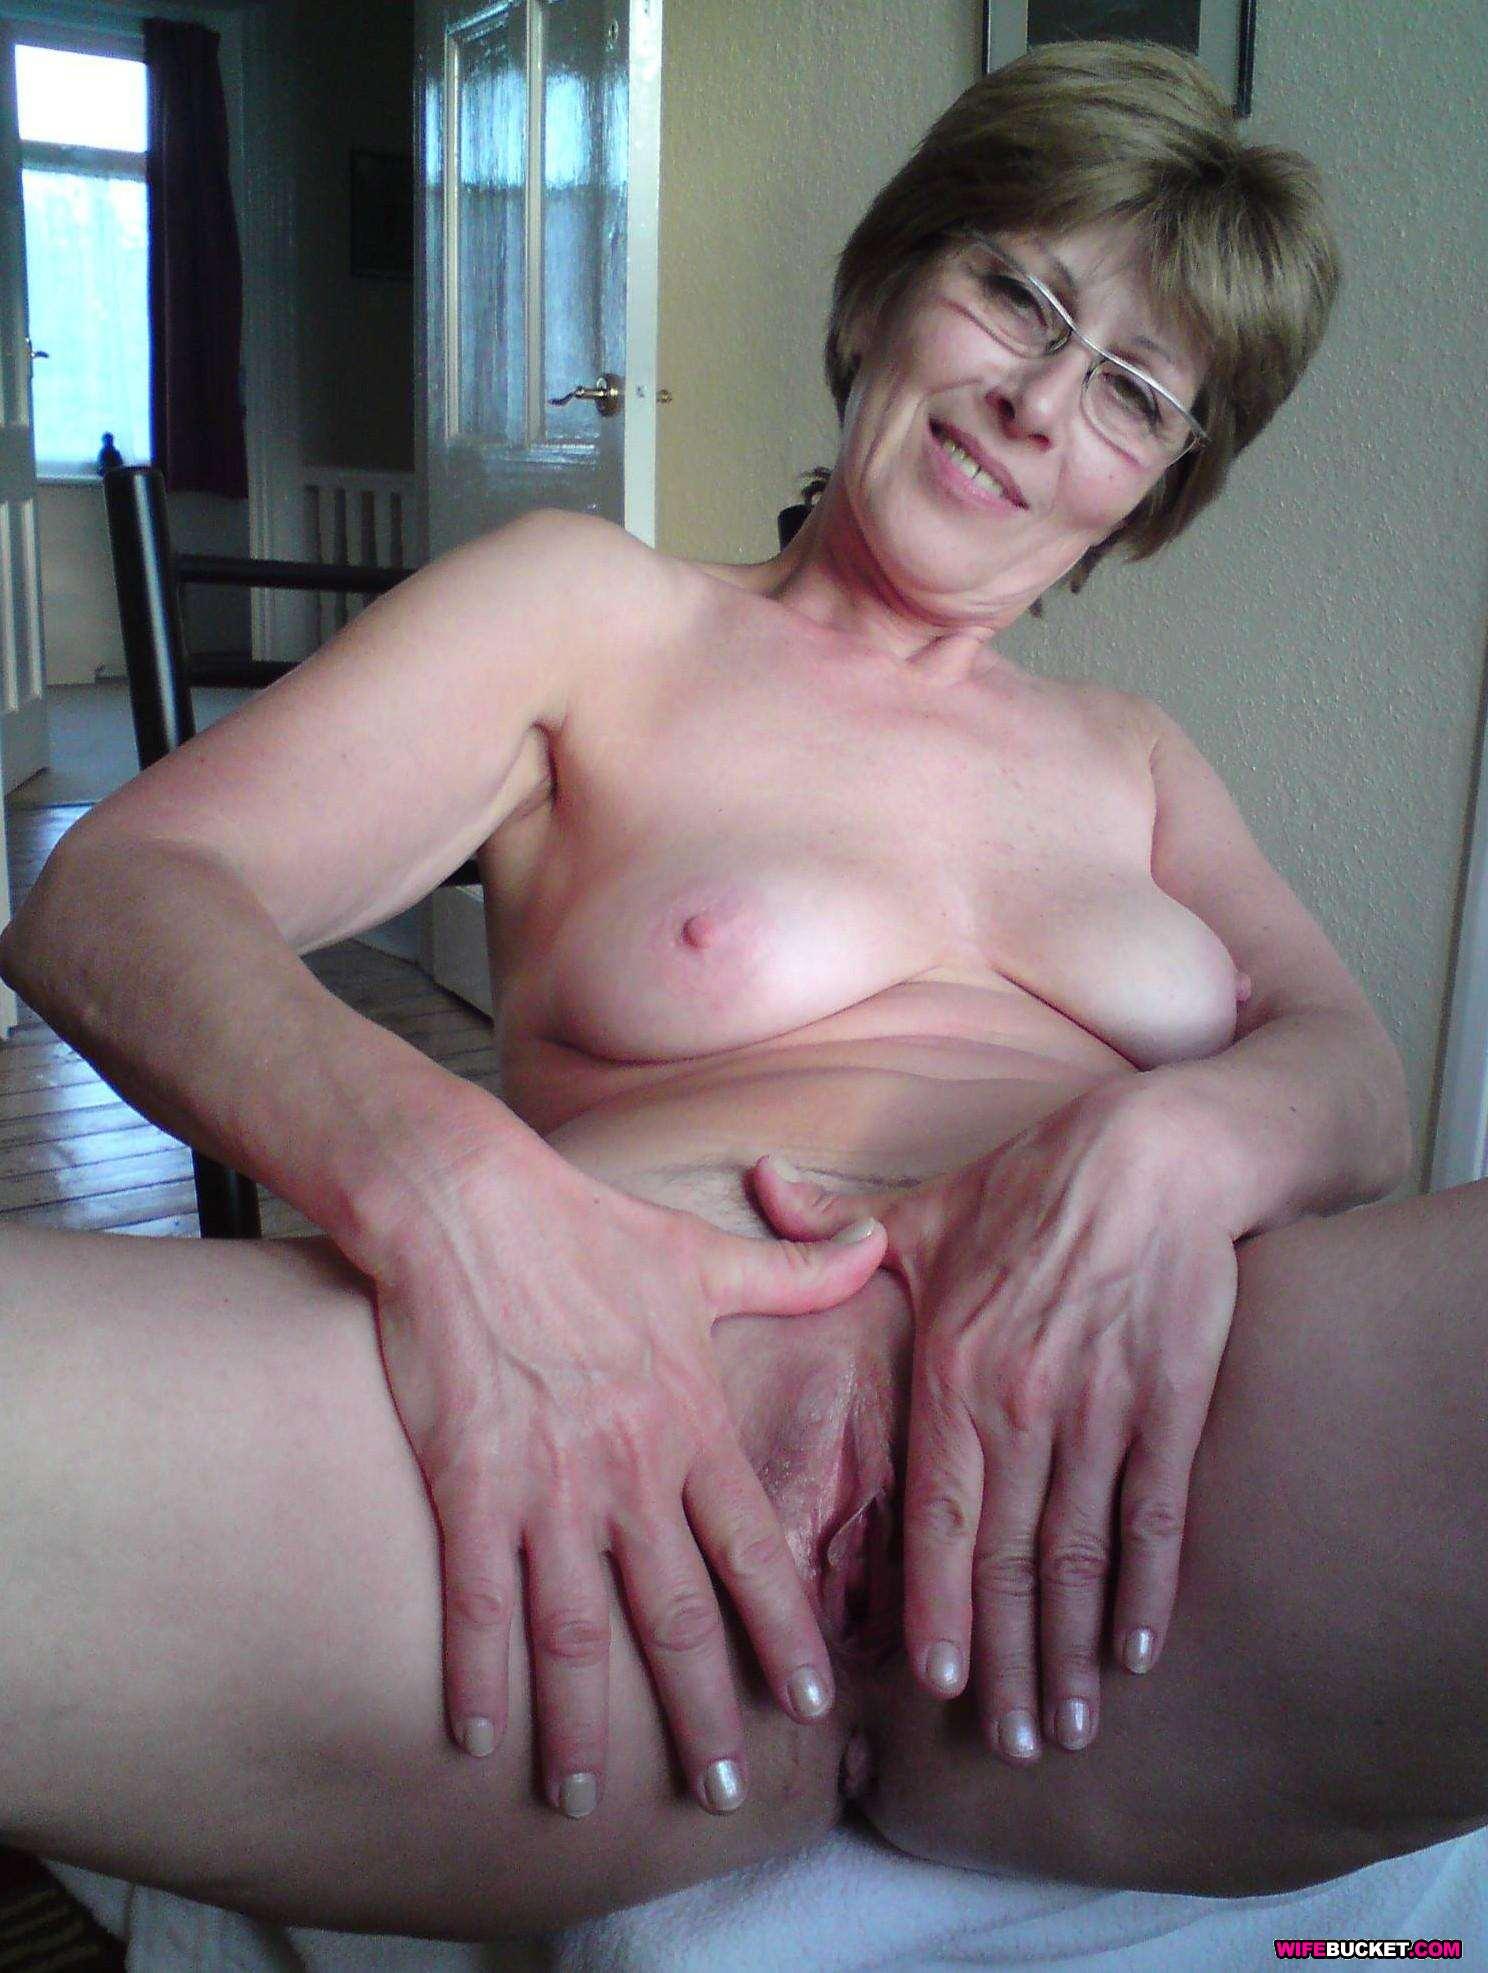 Melissa froio hardcore porn